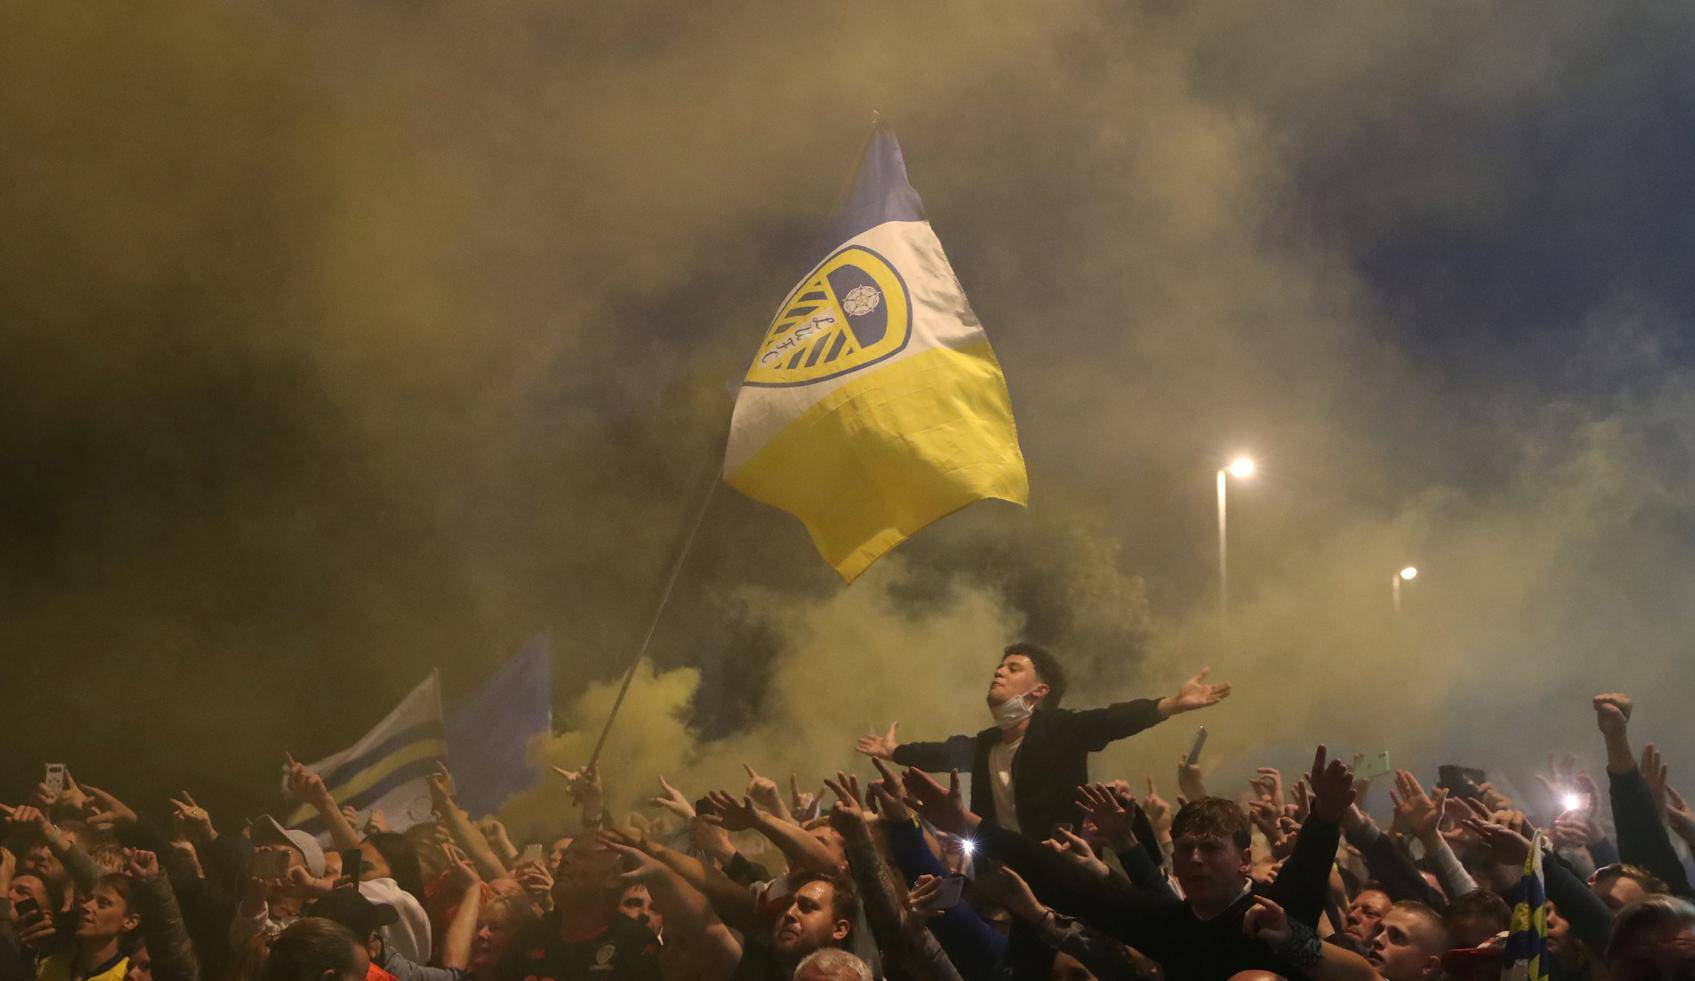 Kakav covid: Nitko nije mogao zaustaviti engleske navijače